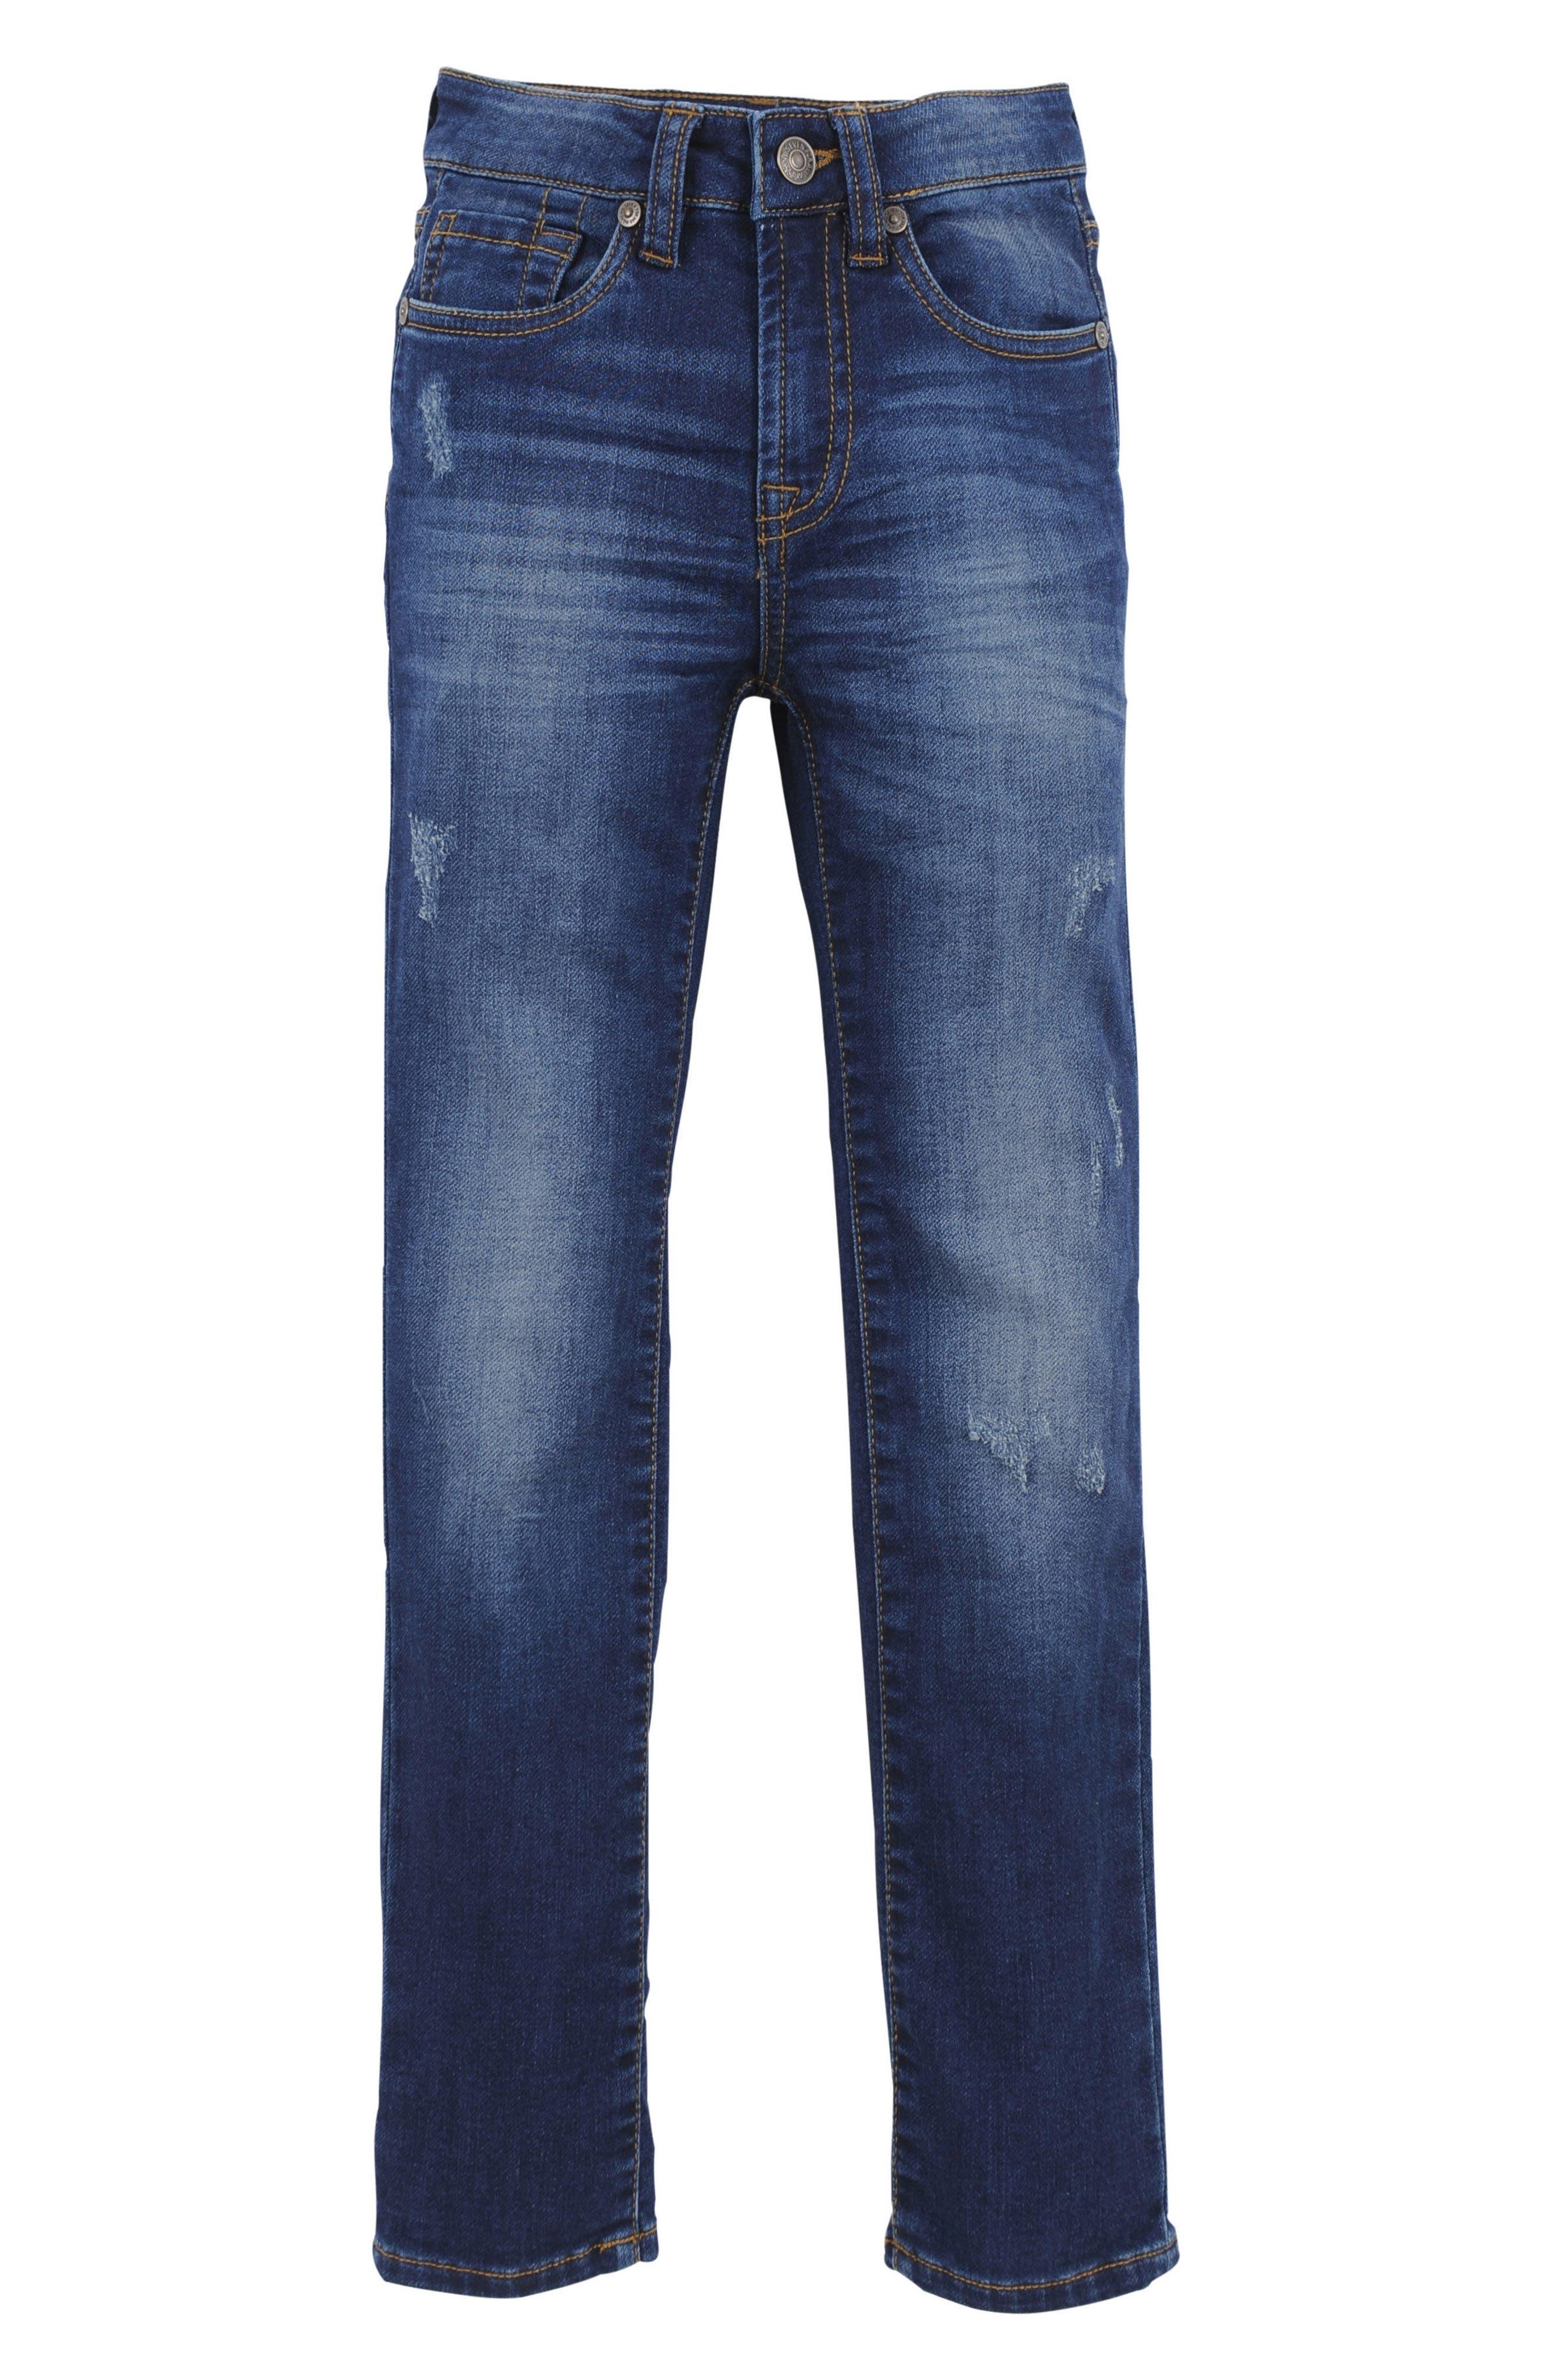 Slimmy Luxe Sport Jeans,                         Main,                         color, Desert Sun